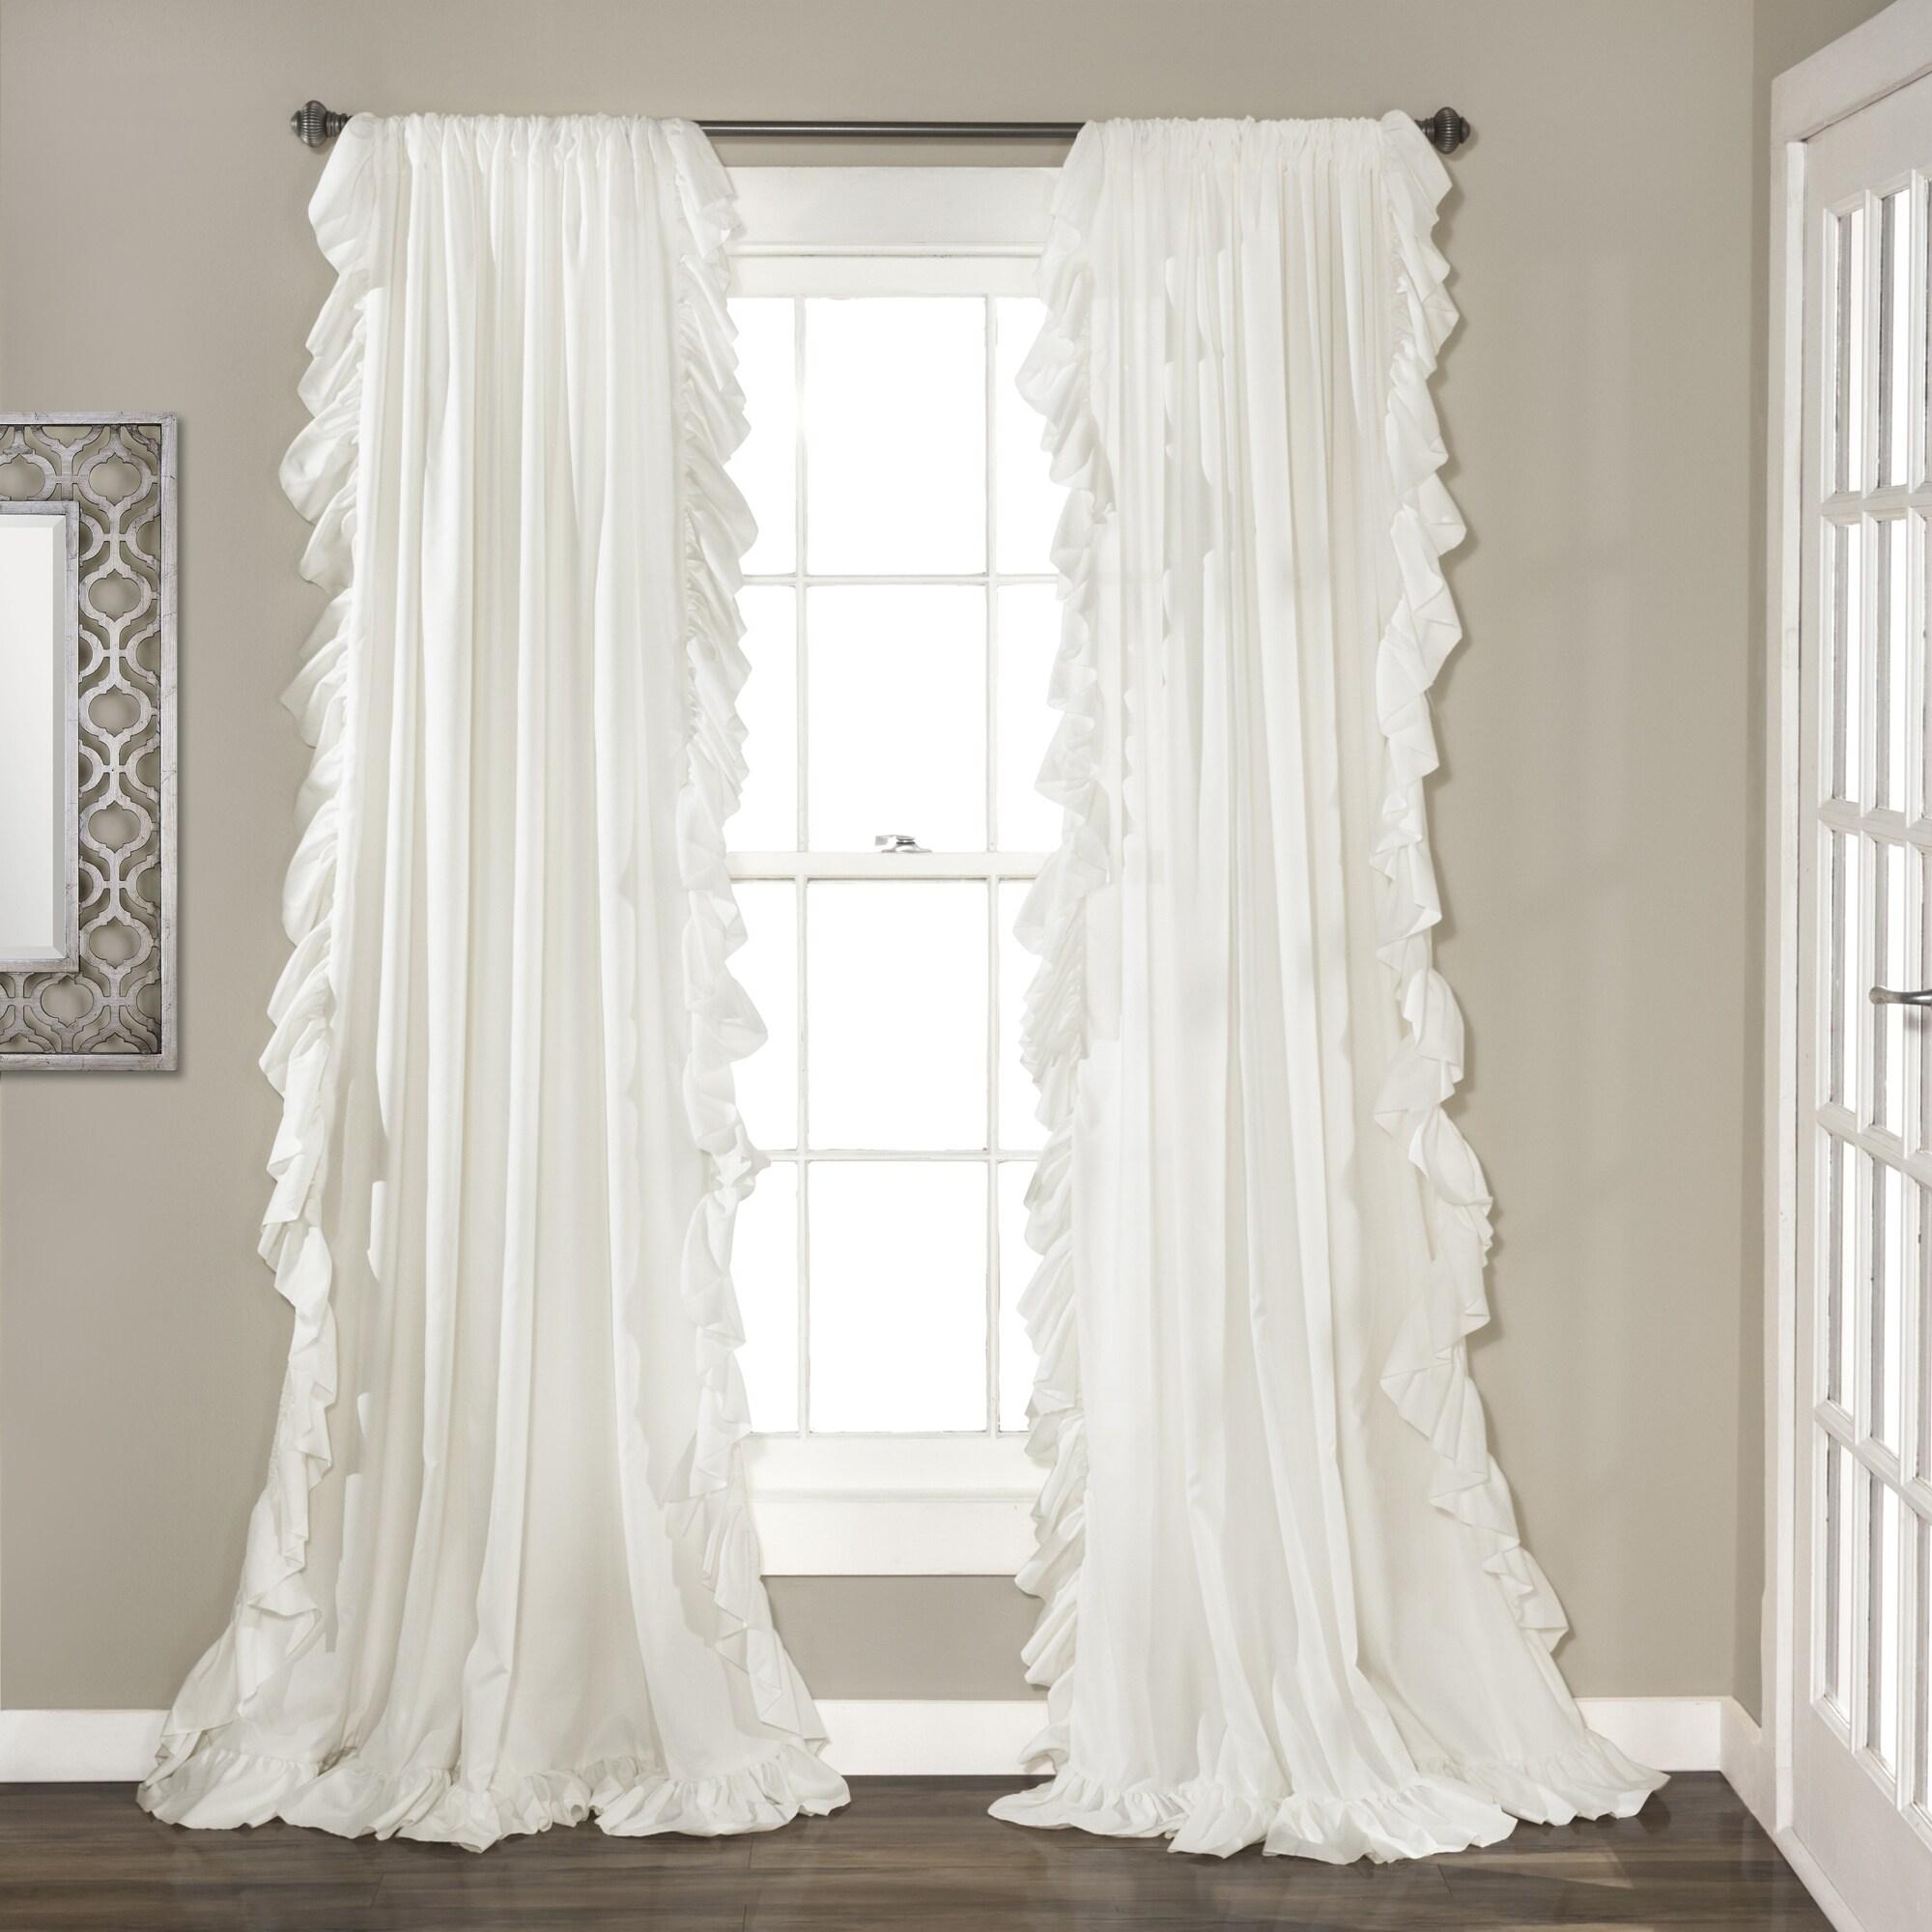 Shop Lush Decor Reyna Curtain Panel Pair Free Shipping